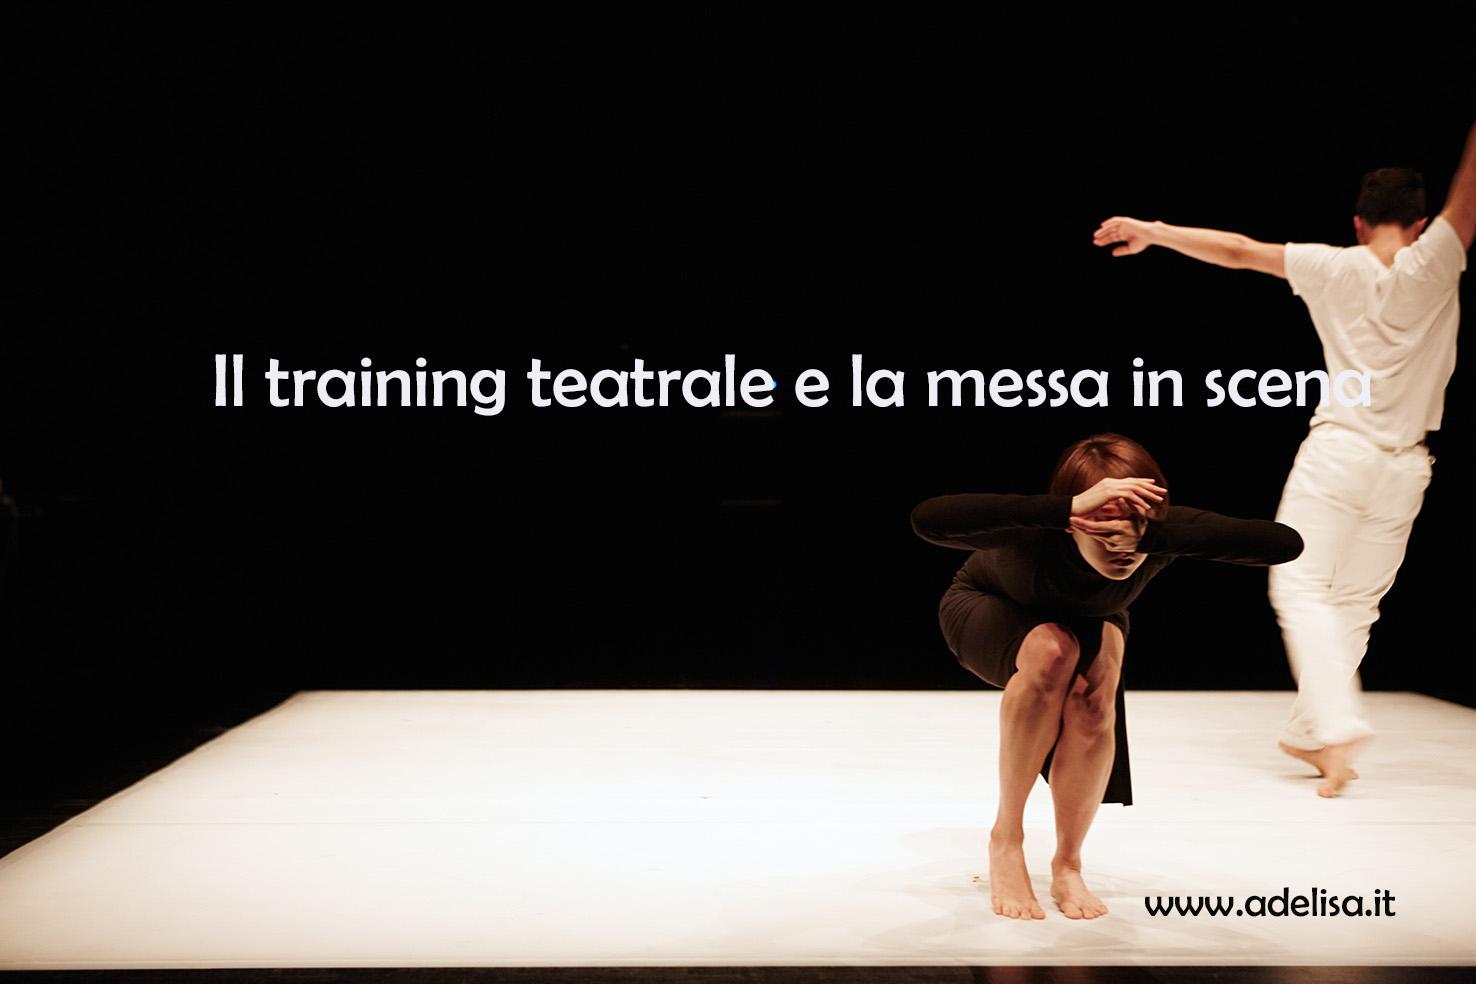 Logo Training teatrale